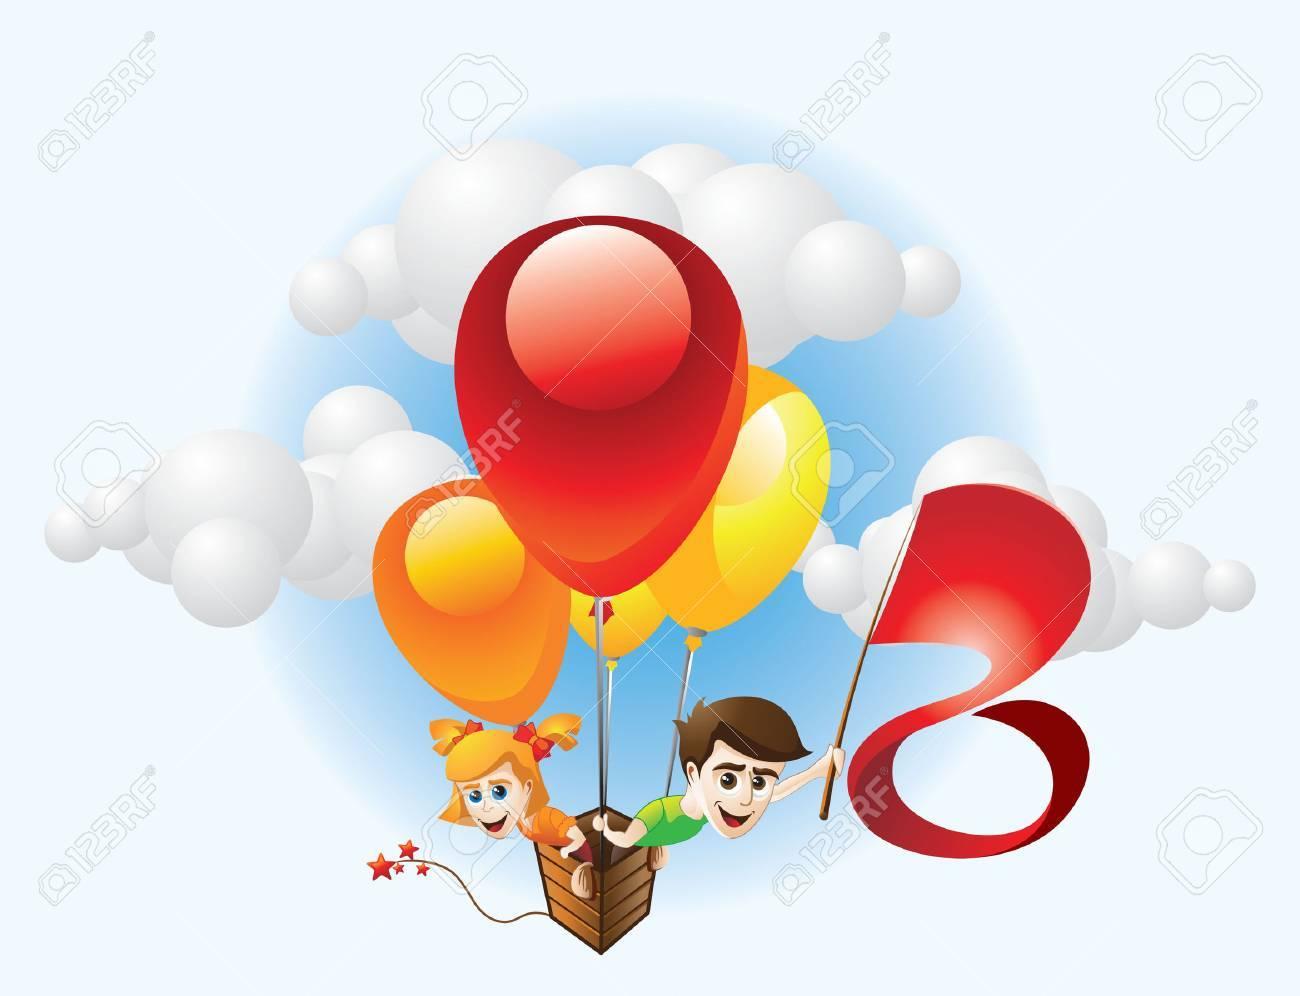 Children and Balloon Stock Vector - 3974827